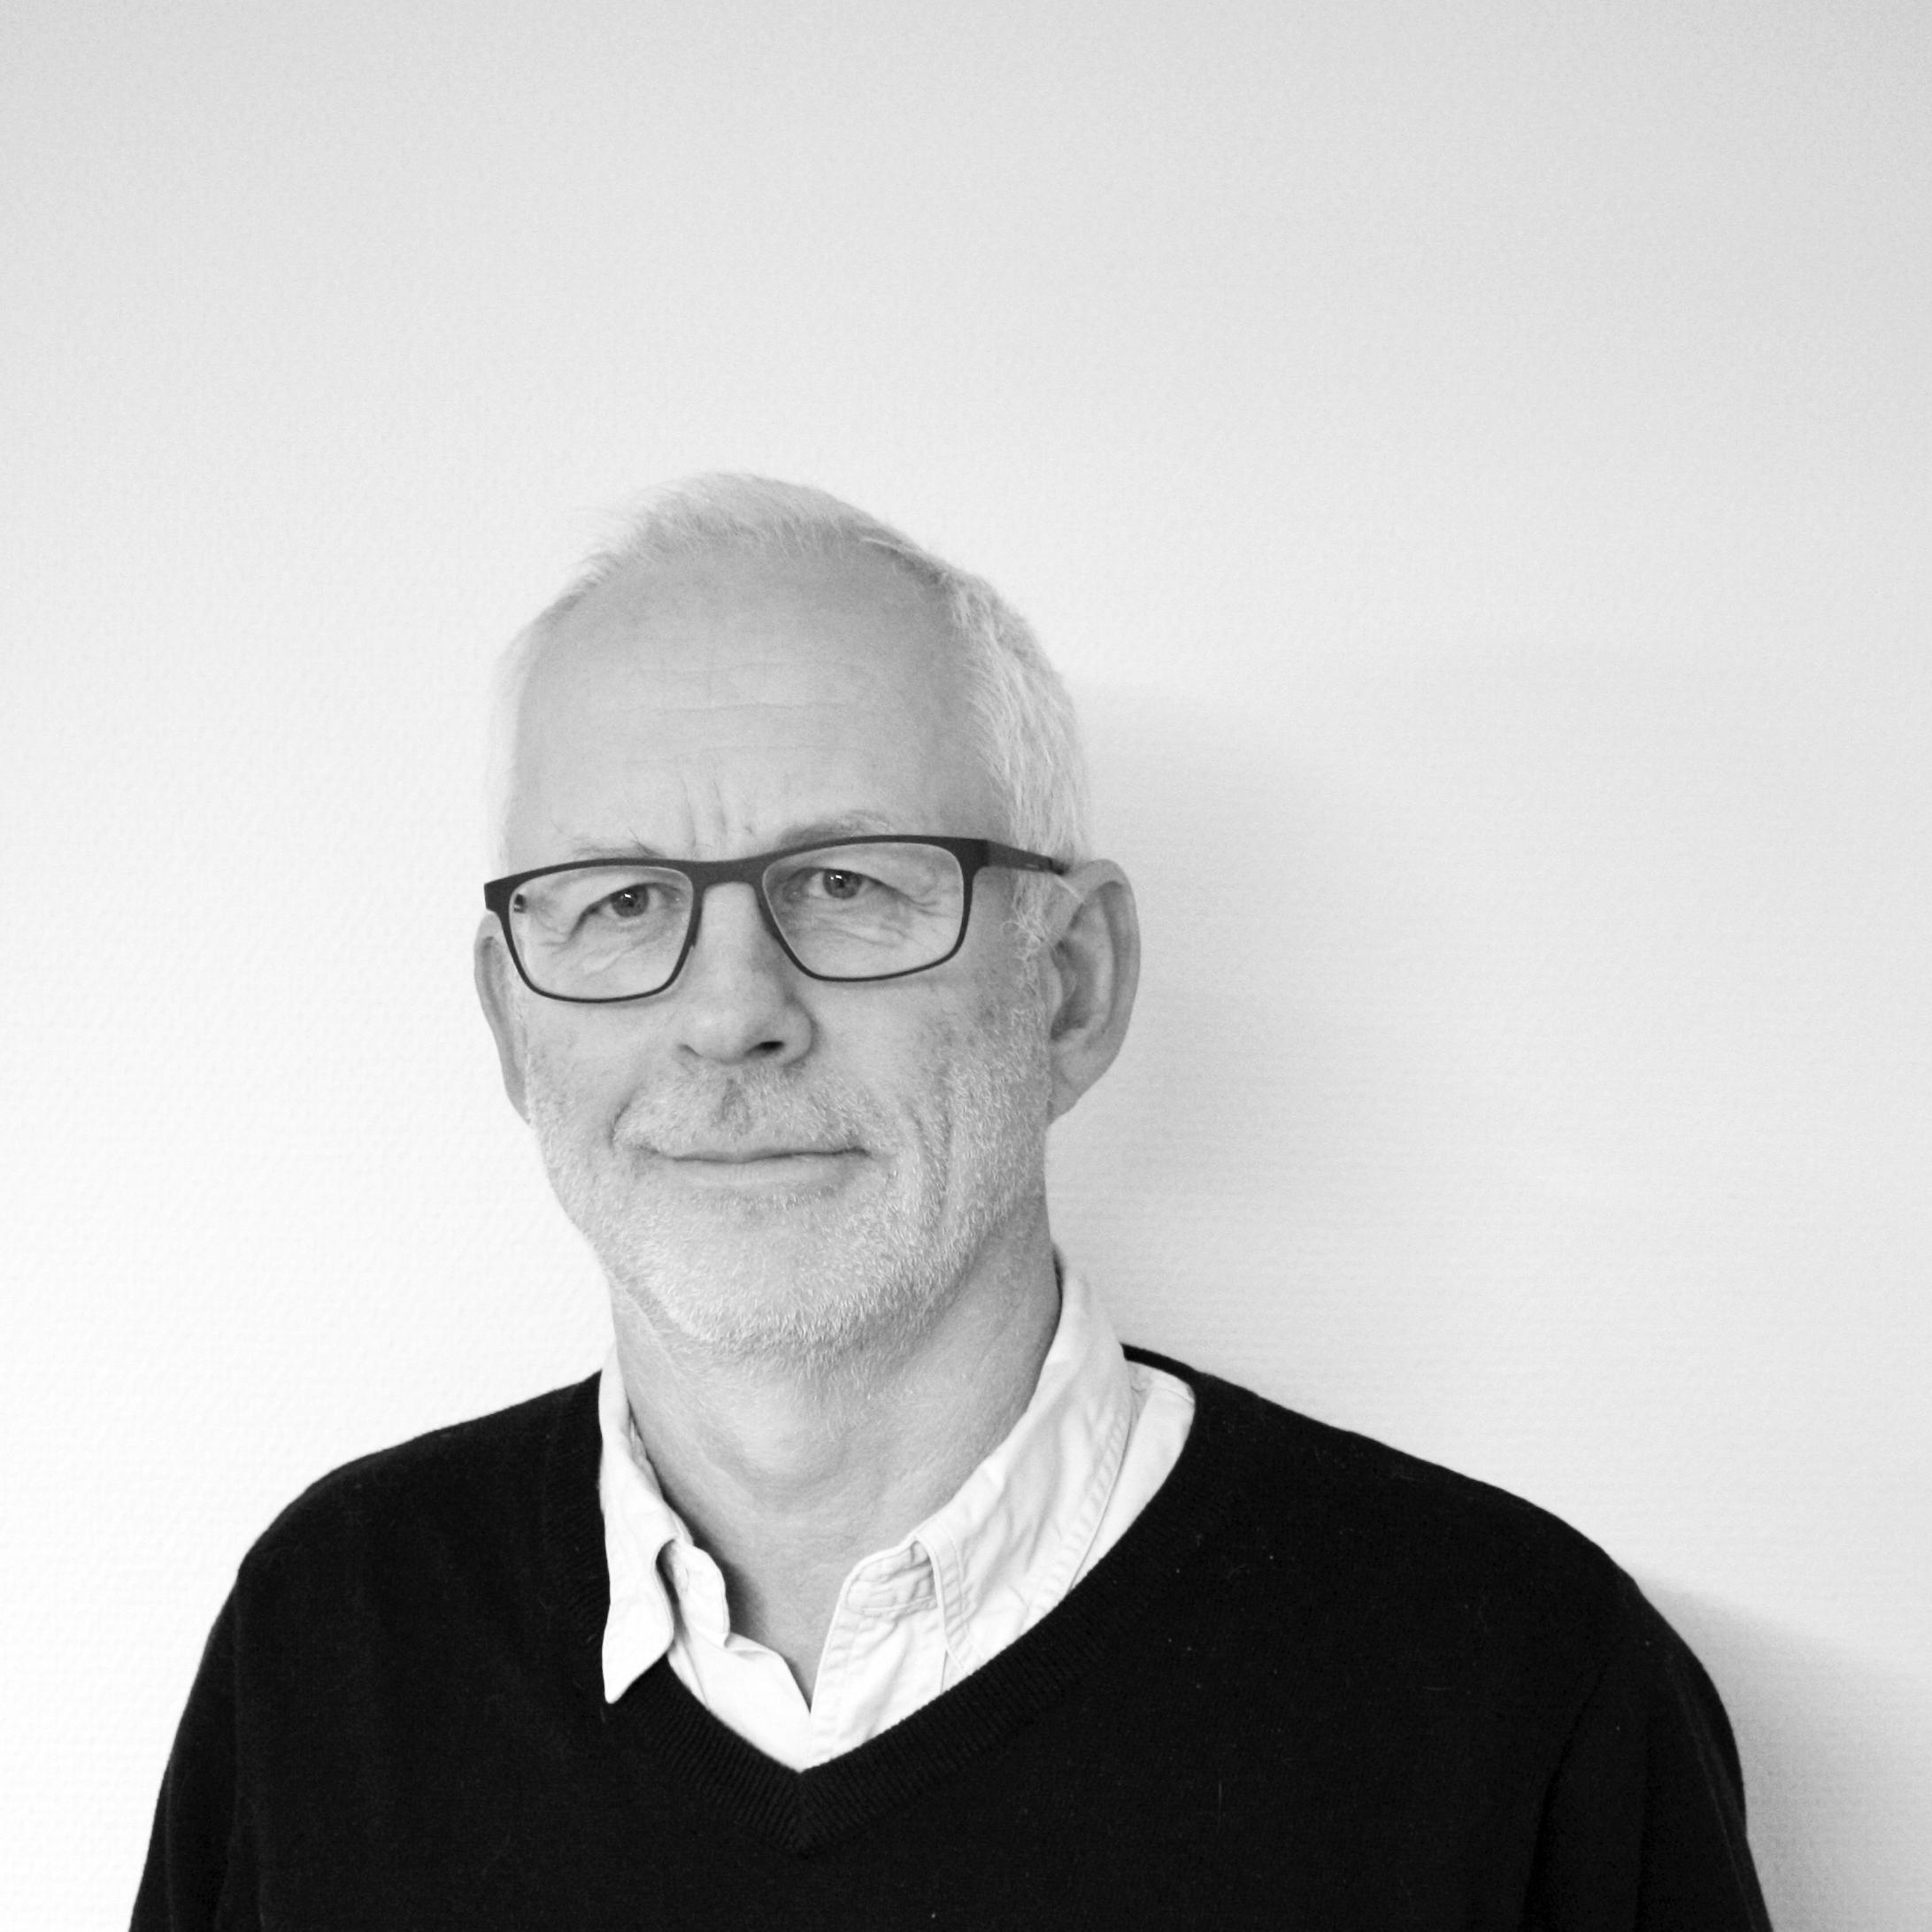 Jan-Fredrik Johansen  Daglig leder / Sivilarkitekt MNAL / NTNU  j  fj@jansen-arkitekter.no  69 24 14 43 / 92 84 62 67